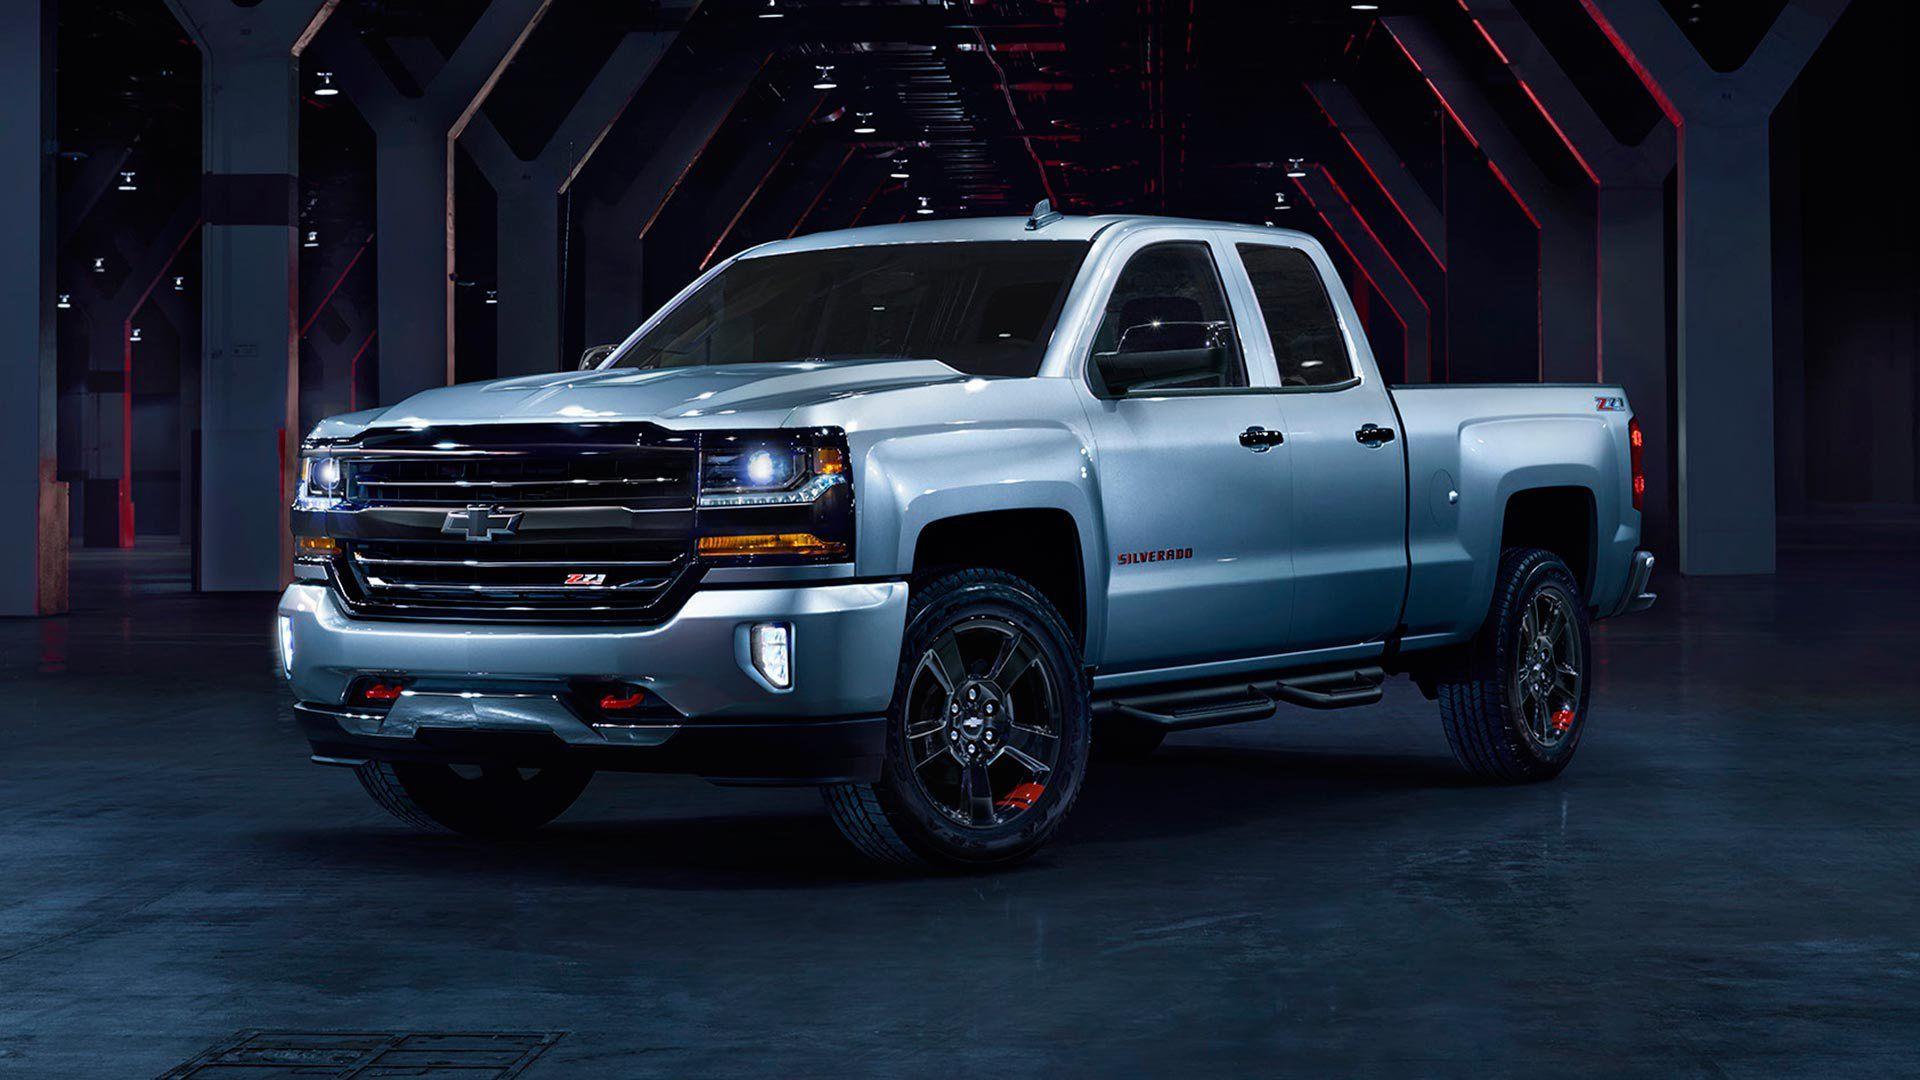 Explore chevy trucks pickup trucks and more